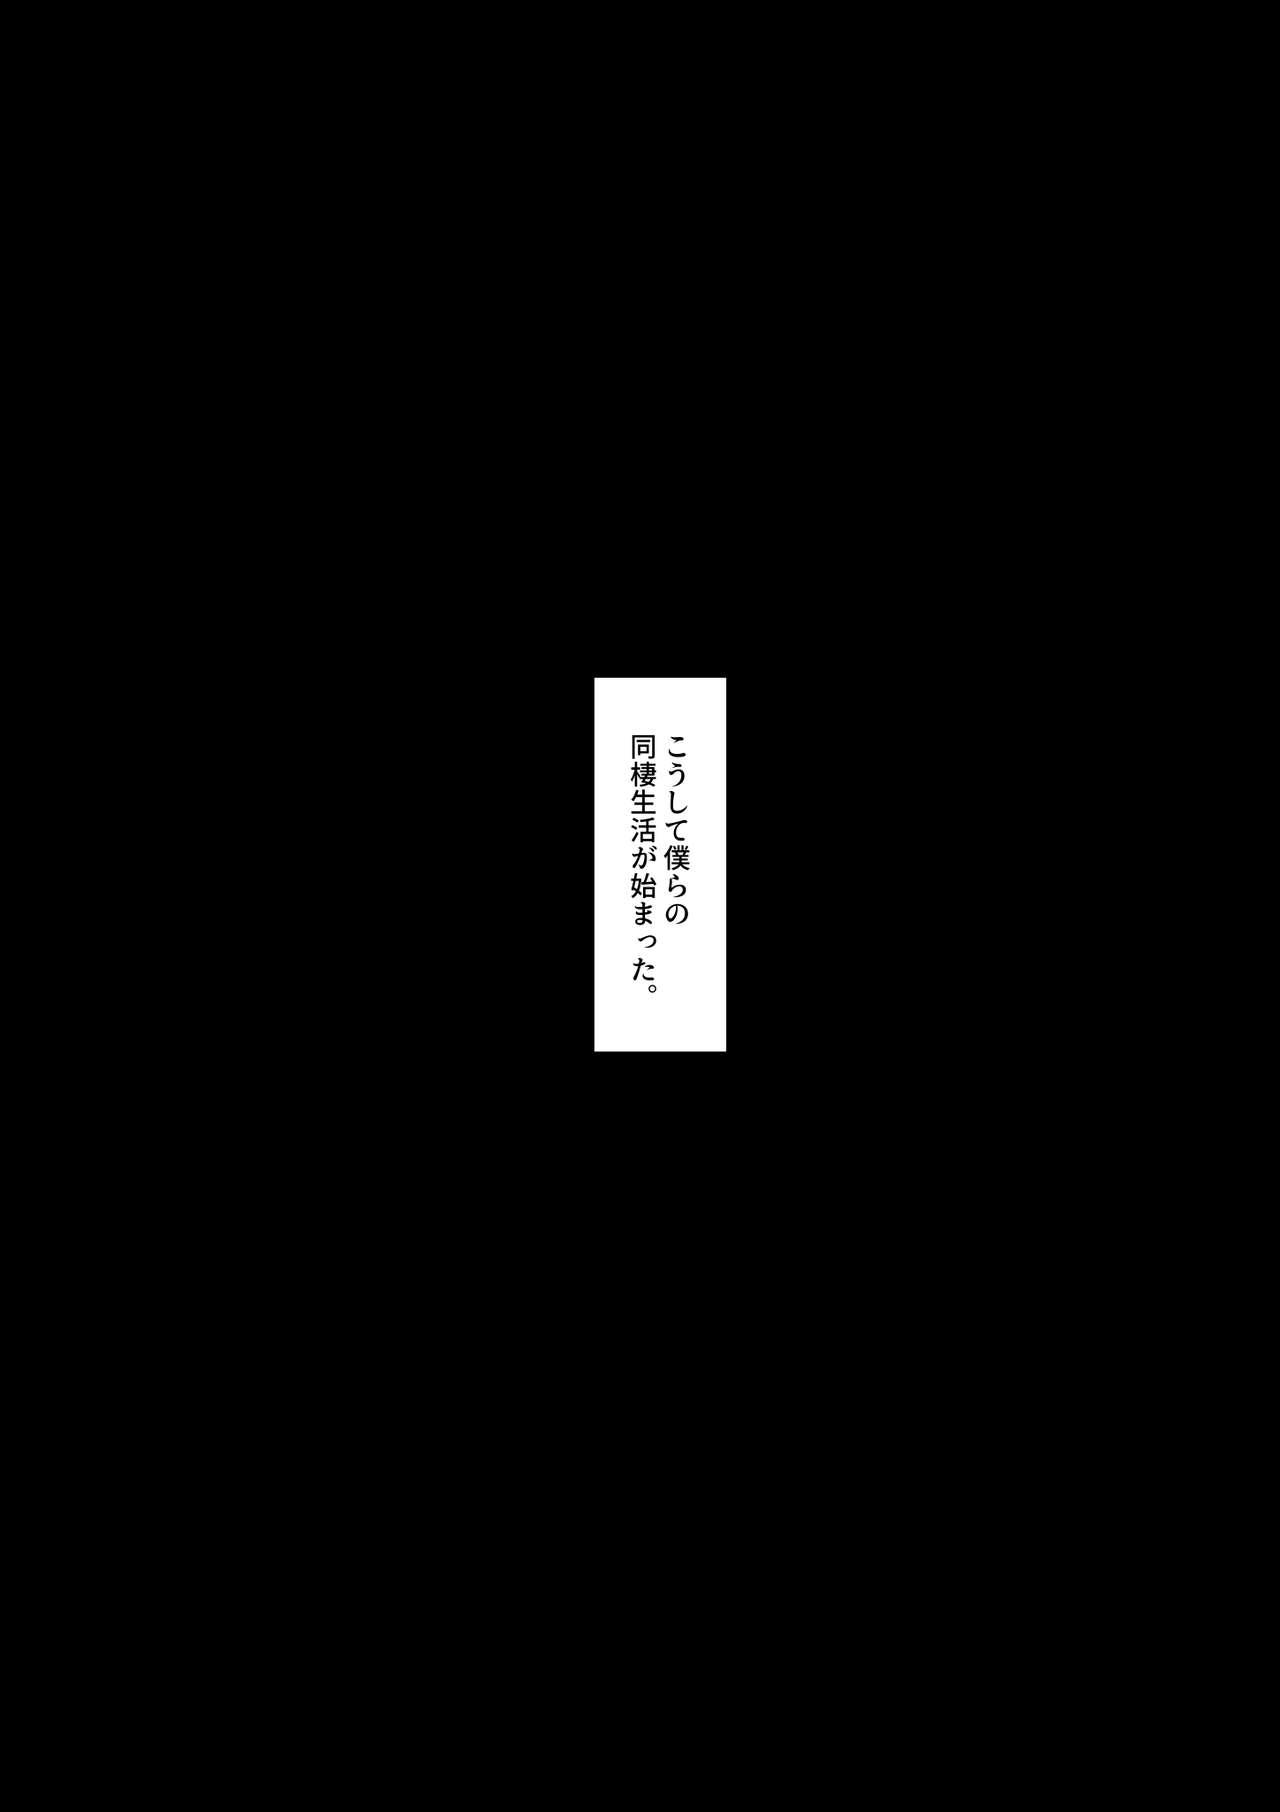 Iede Gal o Hirottara Harem ni Natta Hanashi 36